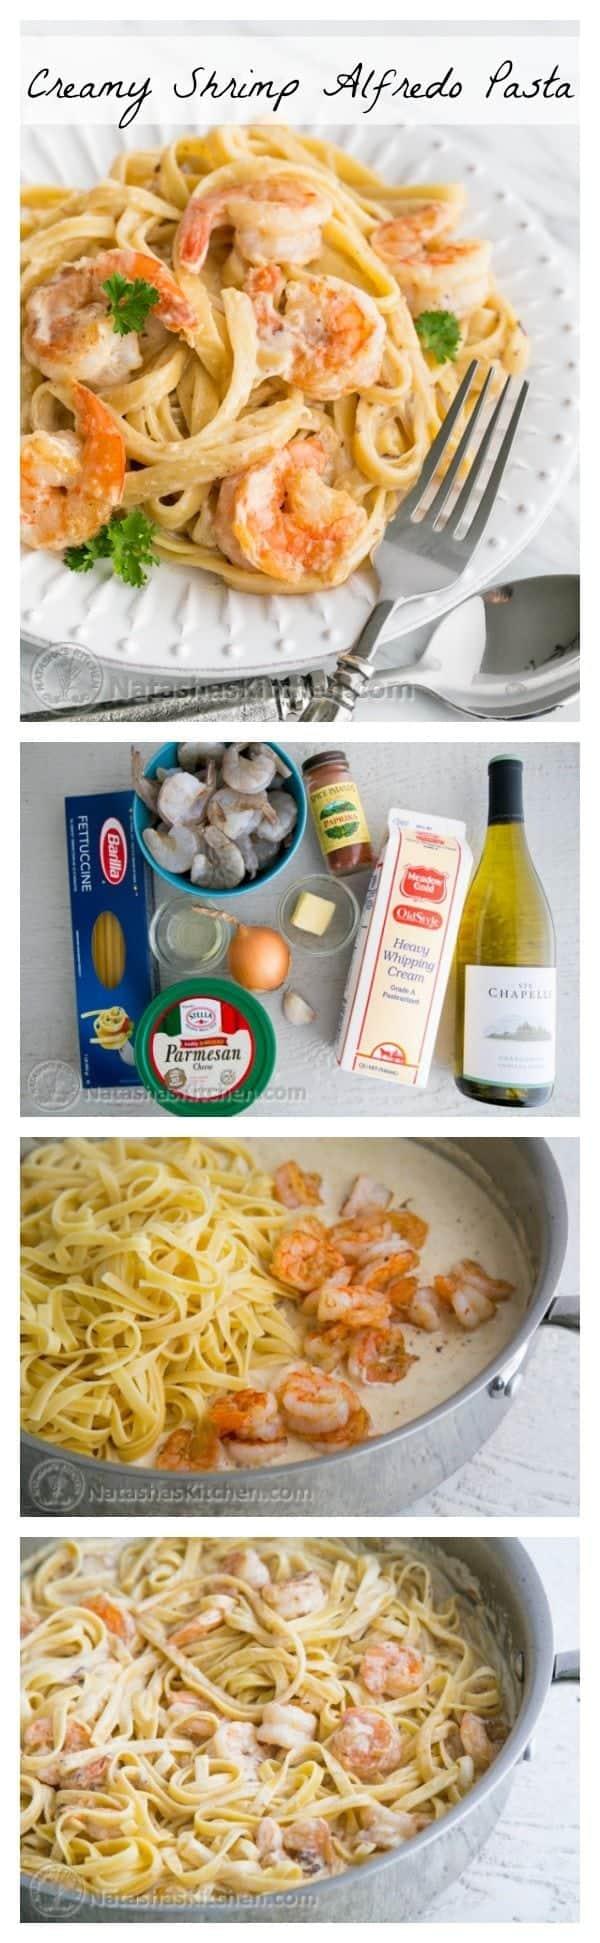 Creamy Shrimp Alfredo Fettuccine Pasta Recipe Natasha 39 S